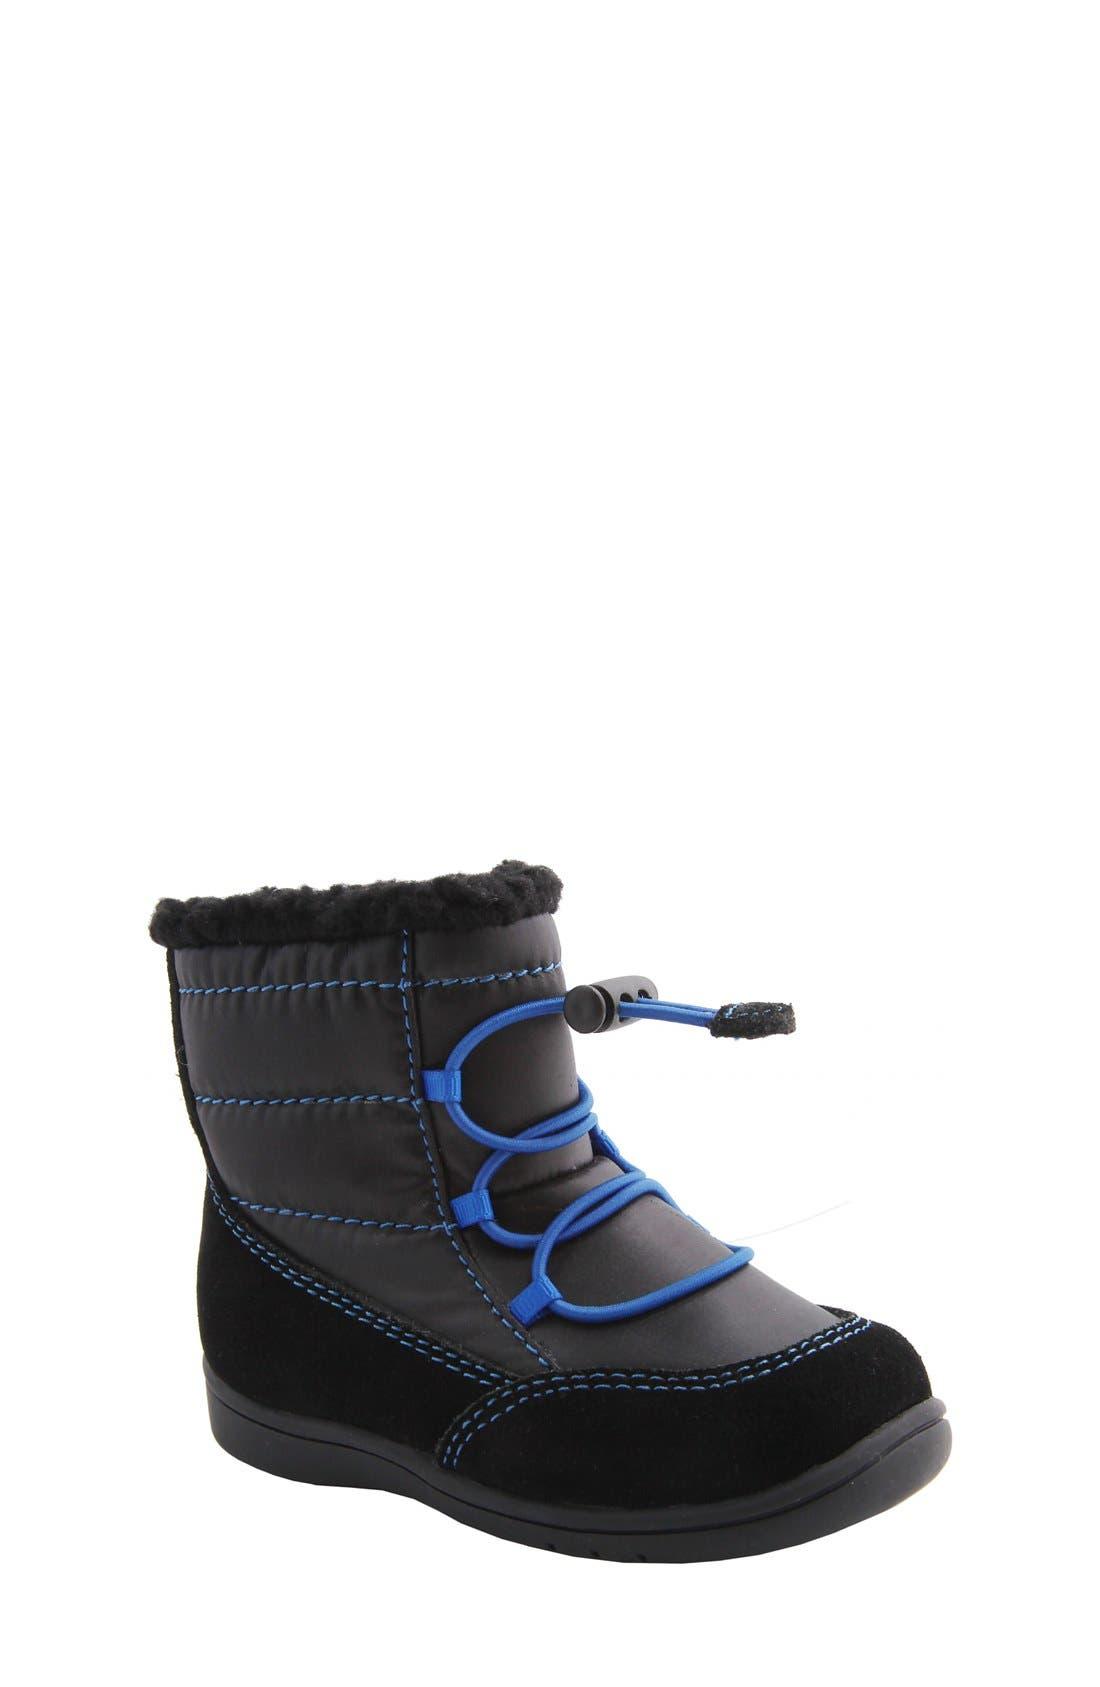 Nina 'Yolie' Lace-Up Boot,                         Main,                         color, Black